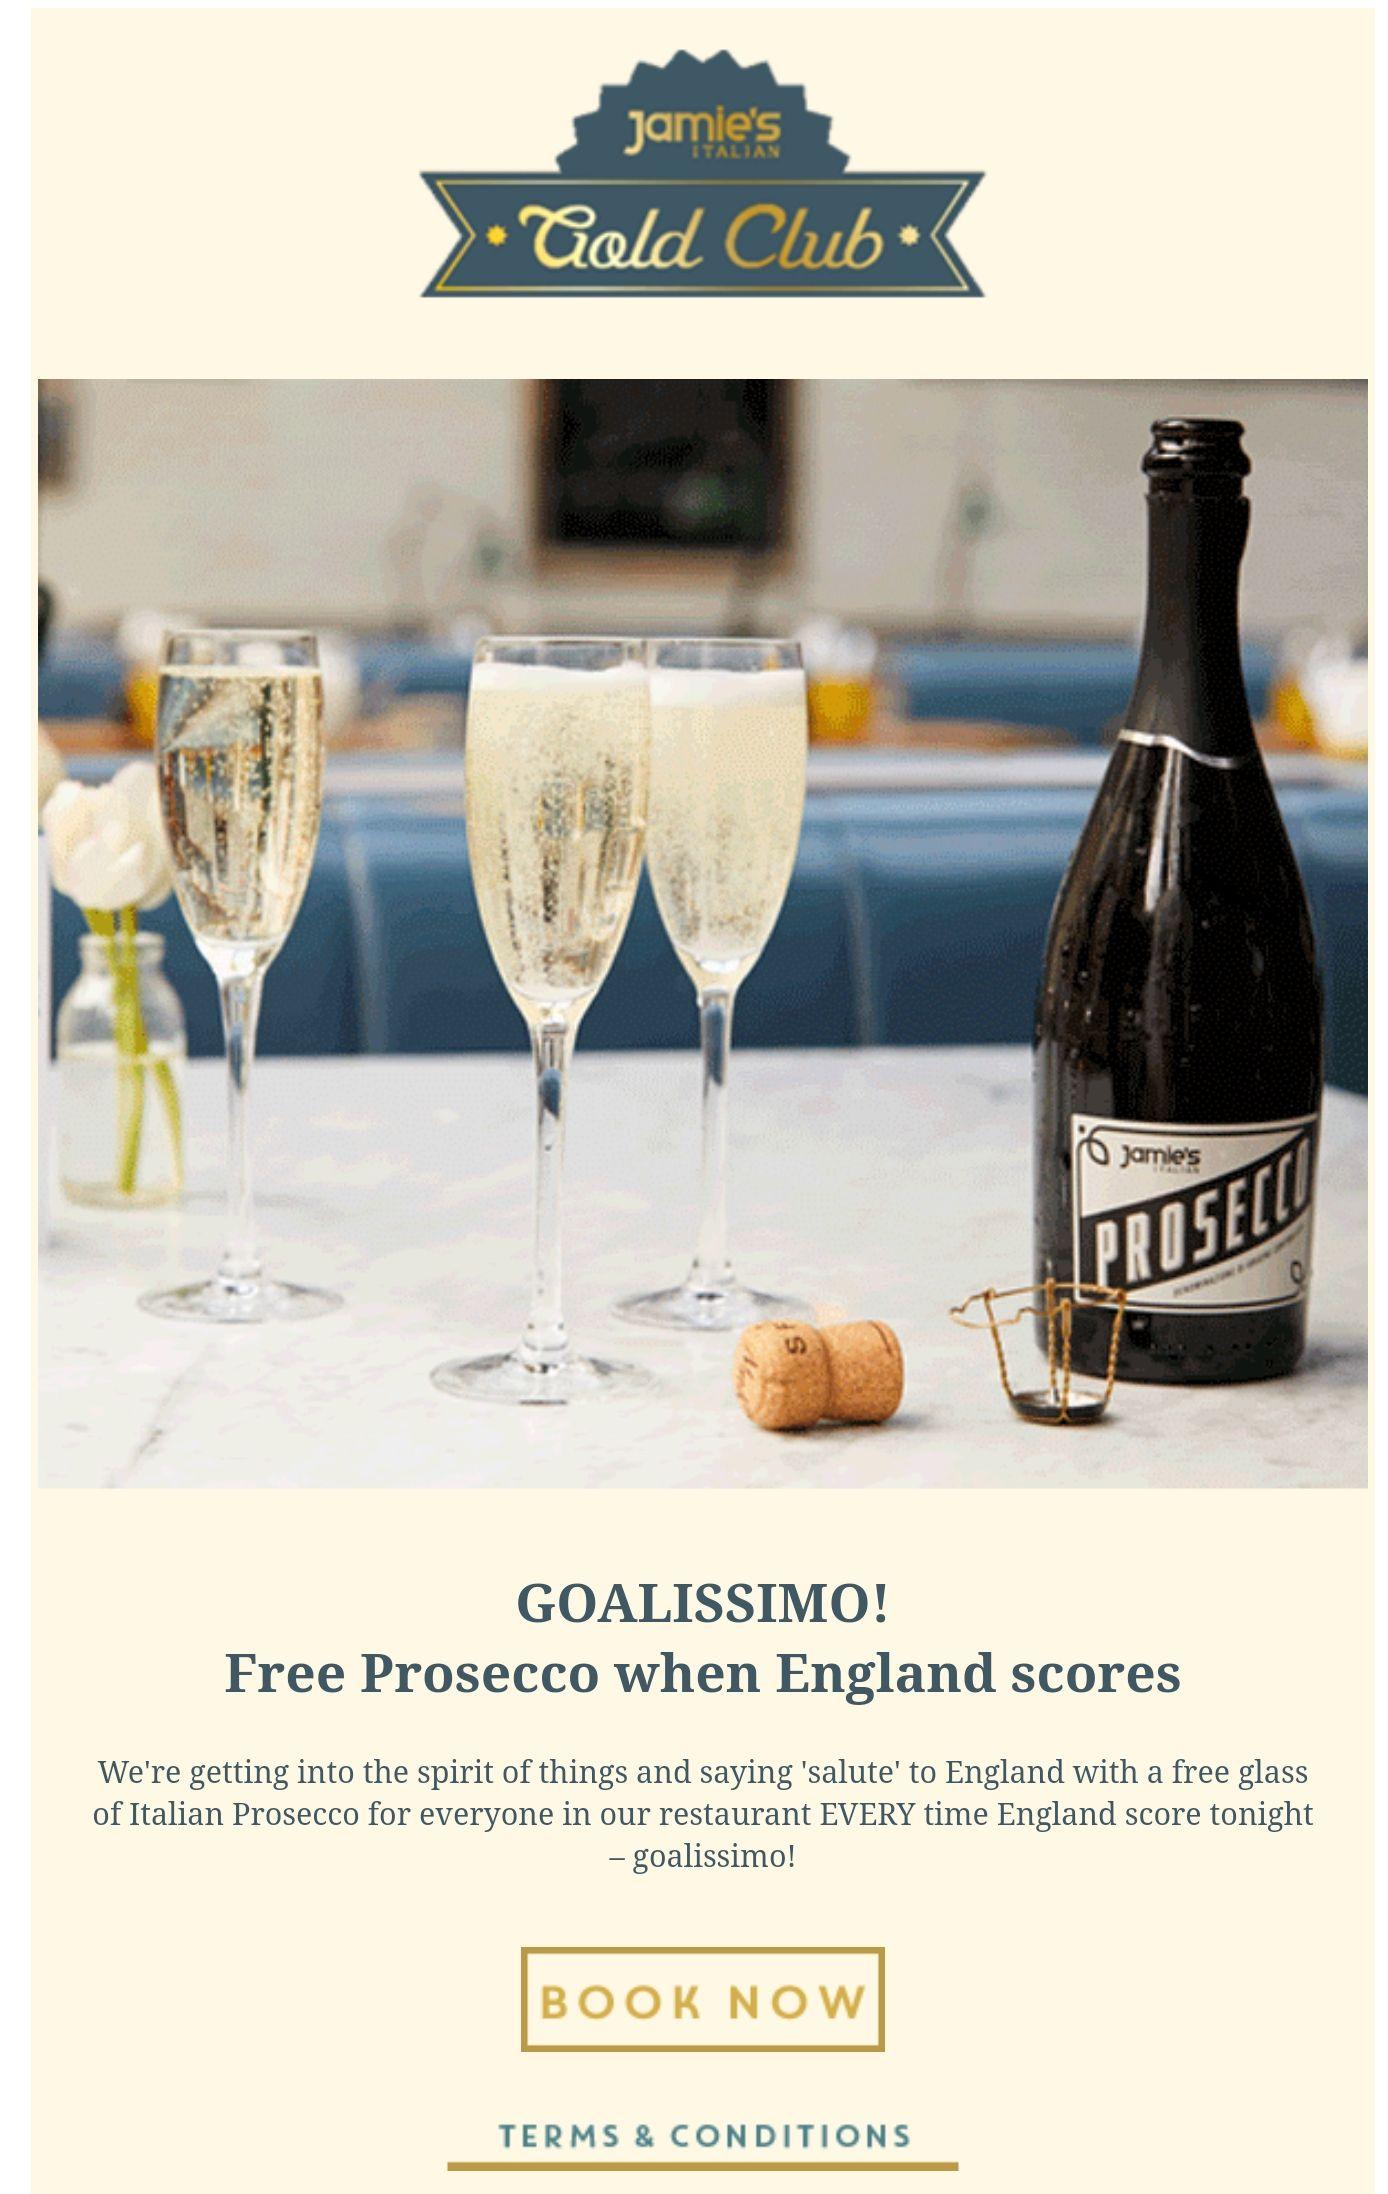 Free Prosecco when England scores at Jamie's Italian